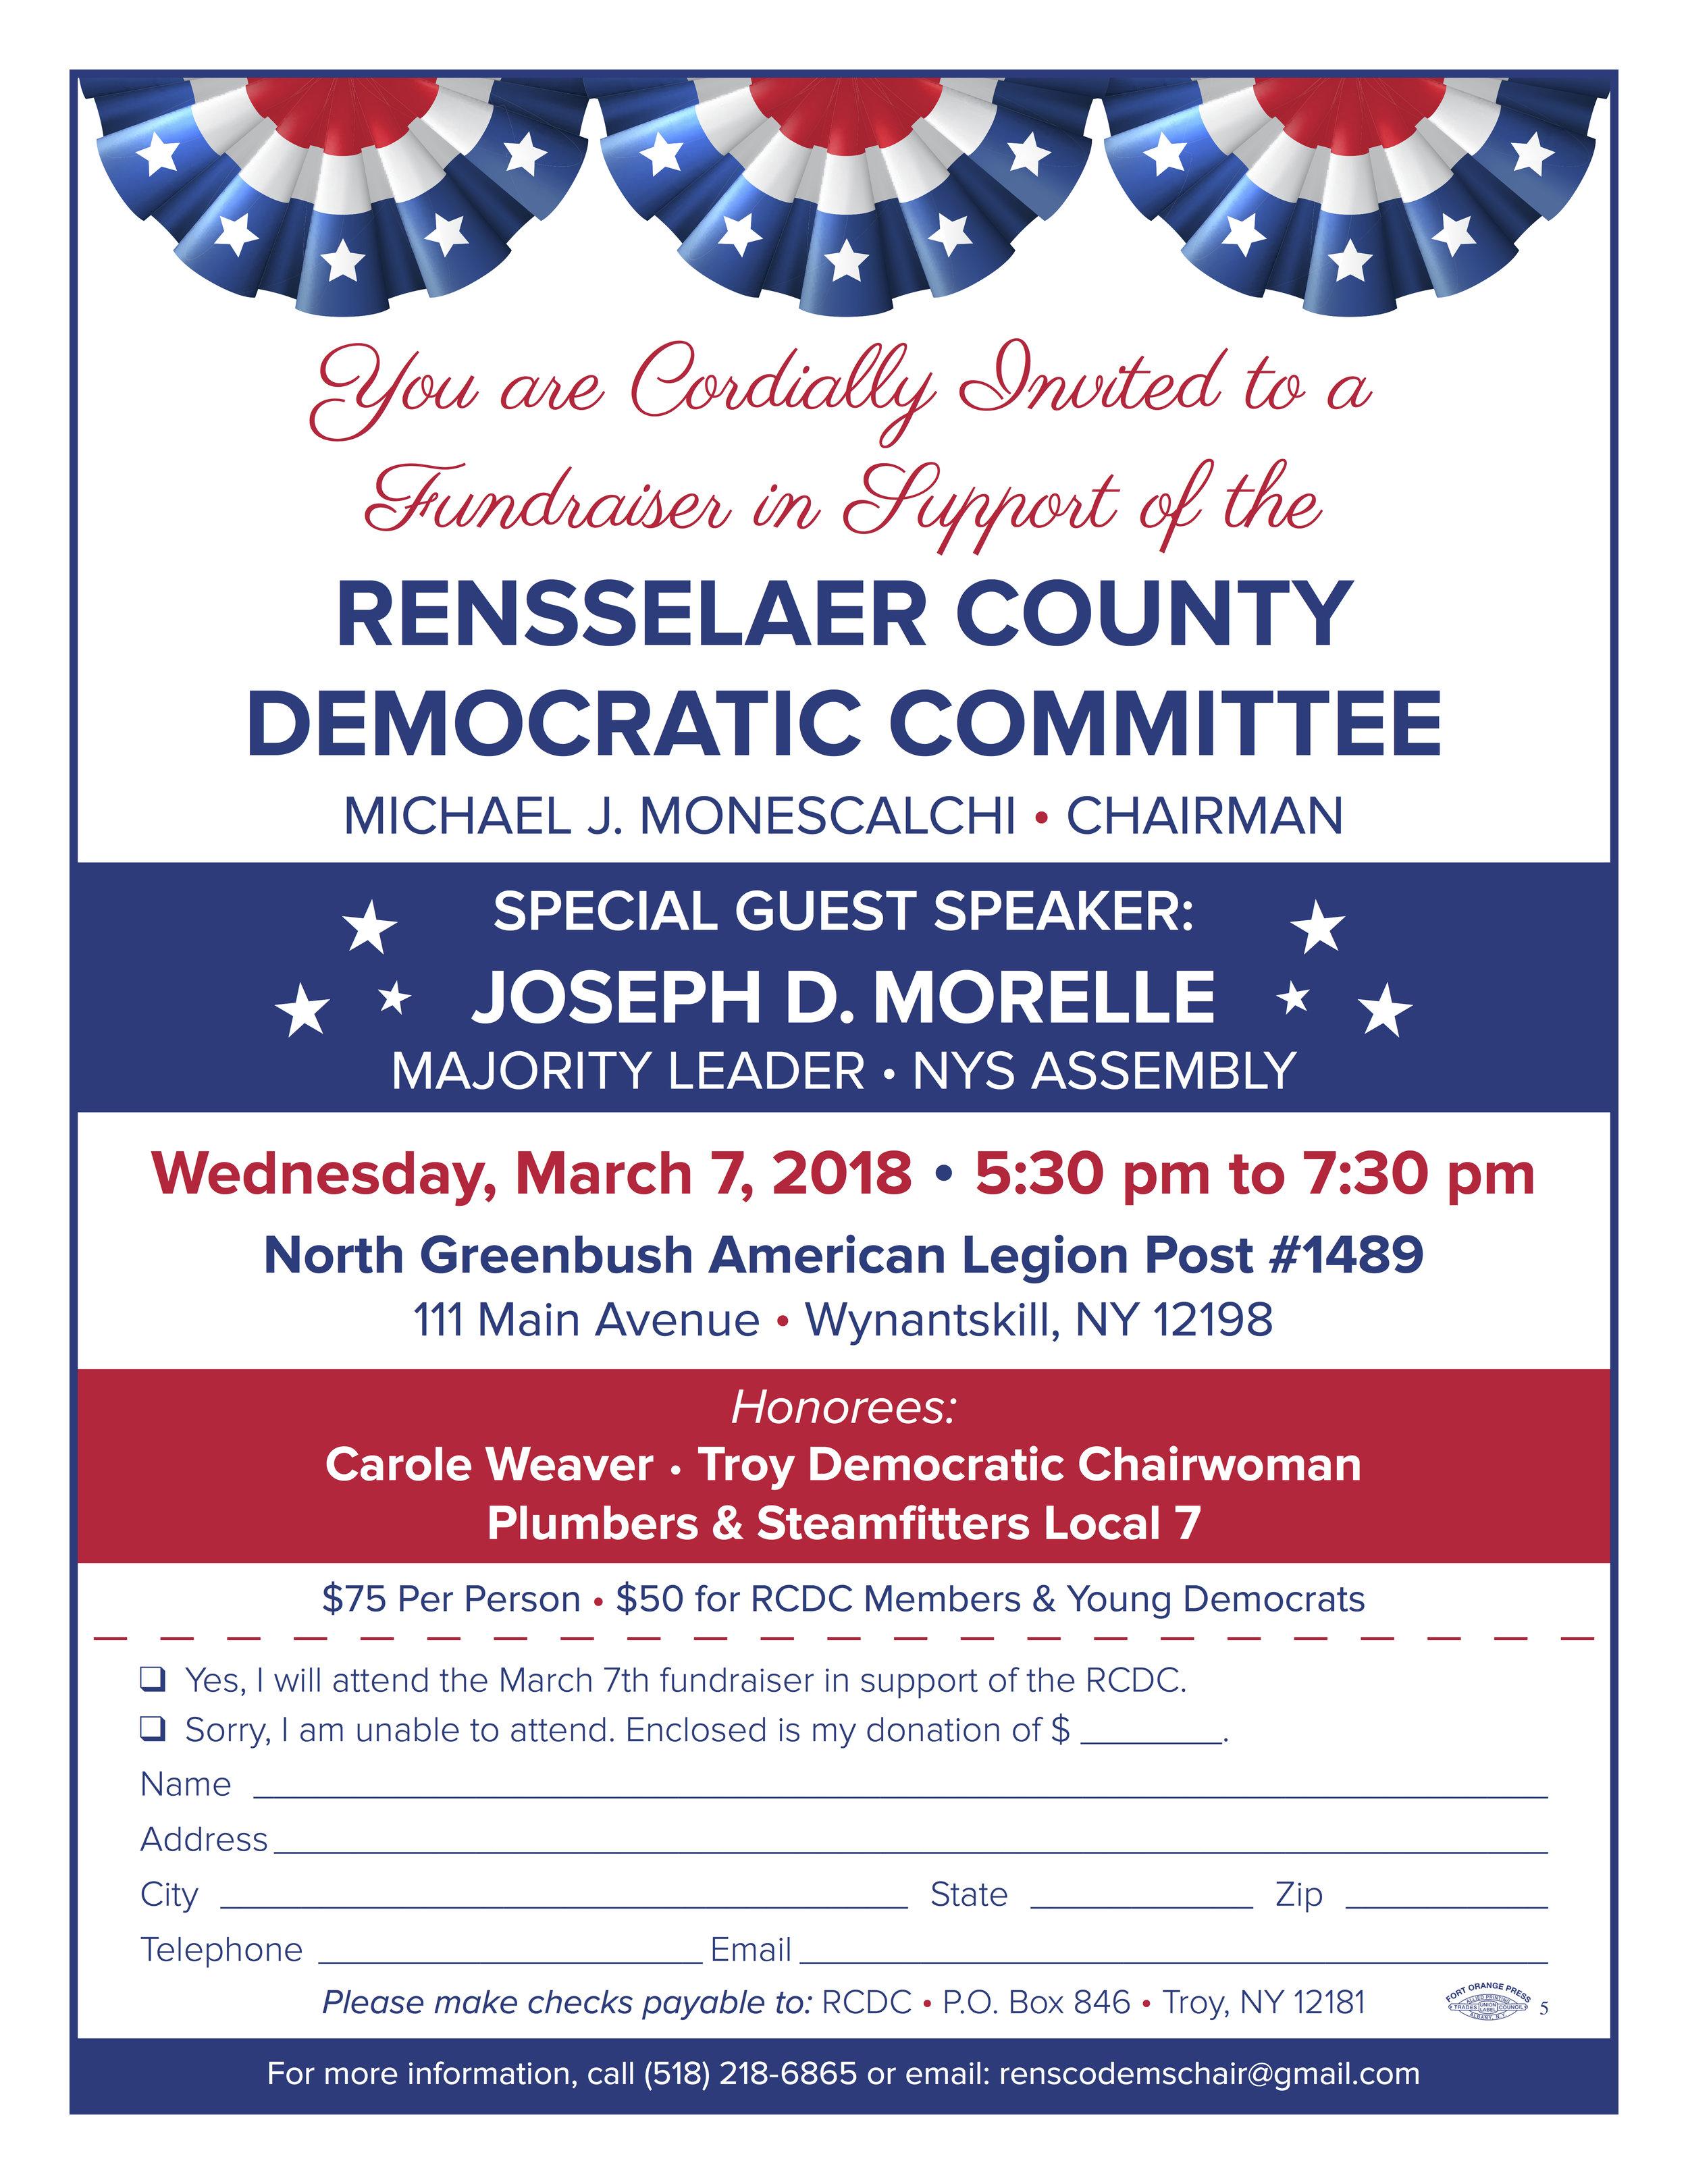 Rensselaer County Democratic Committee Fundraiser Invite - March 7 2018.jpg